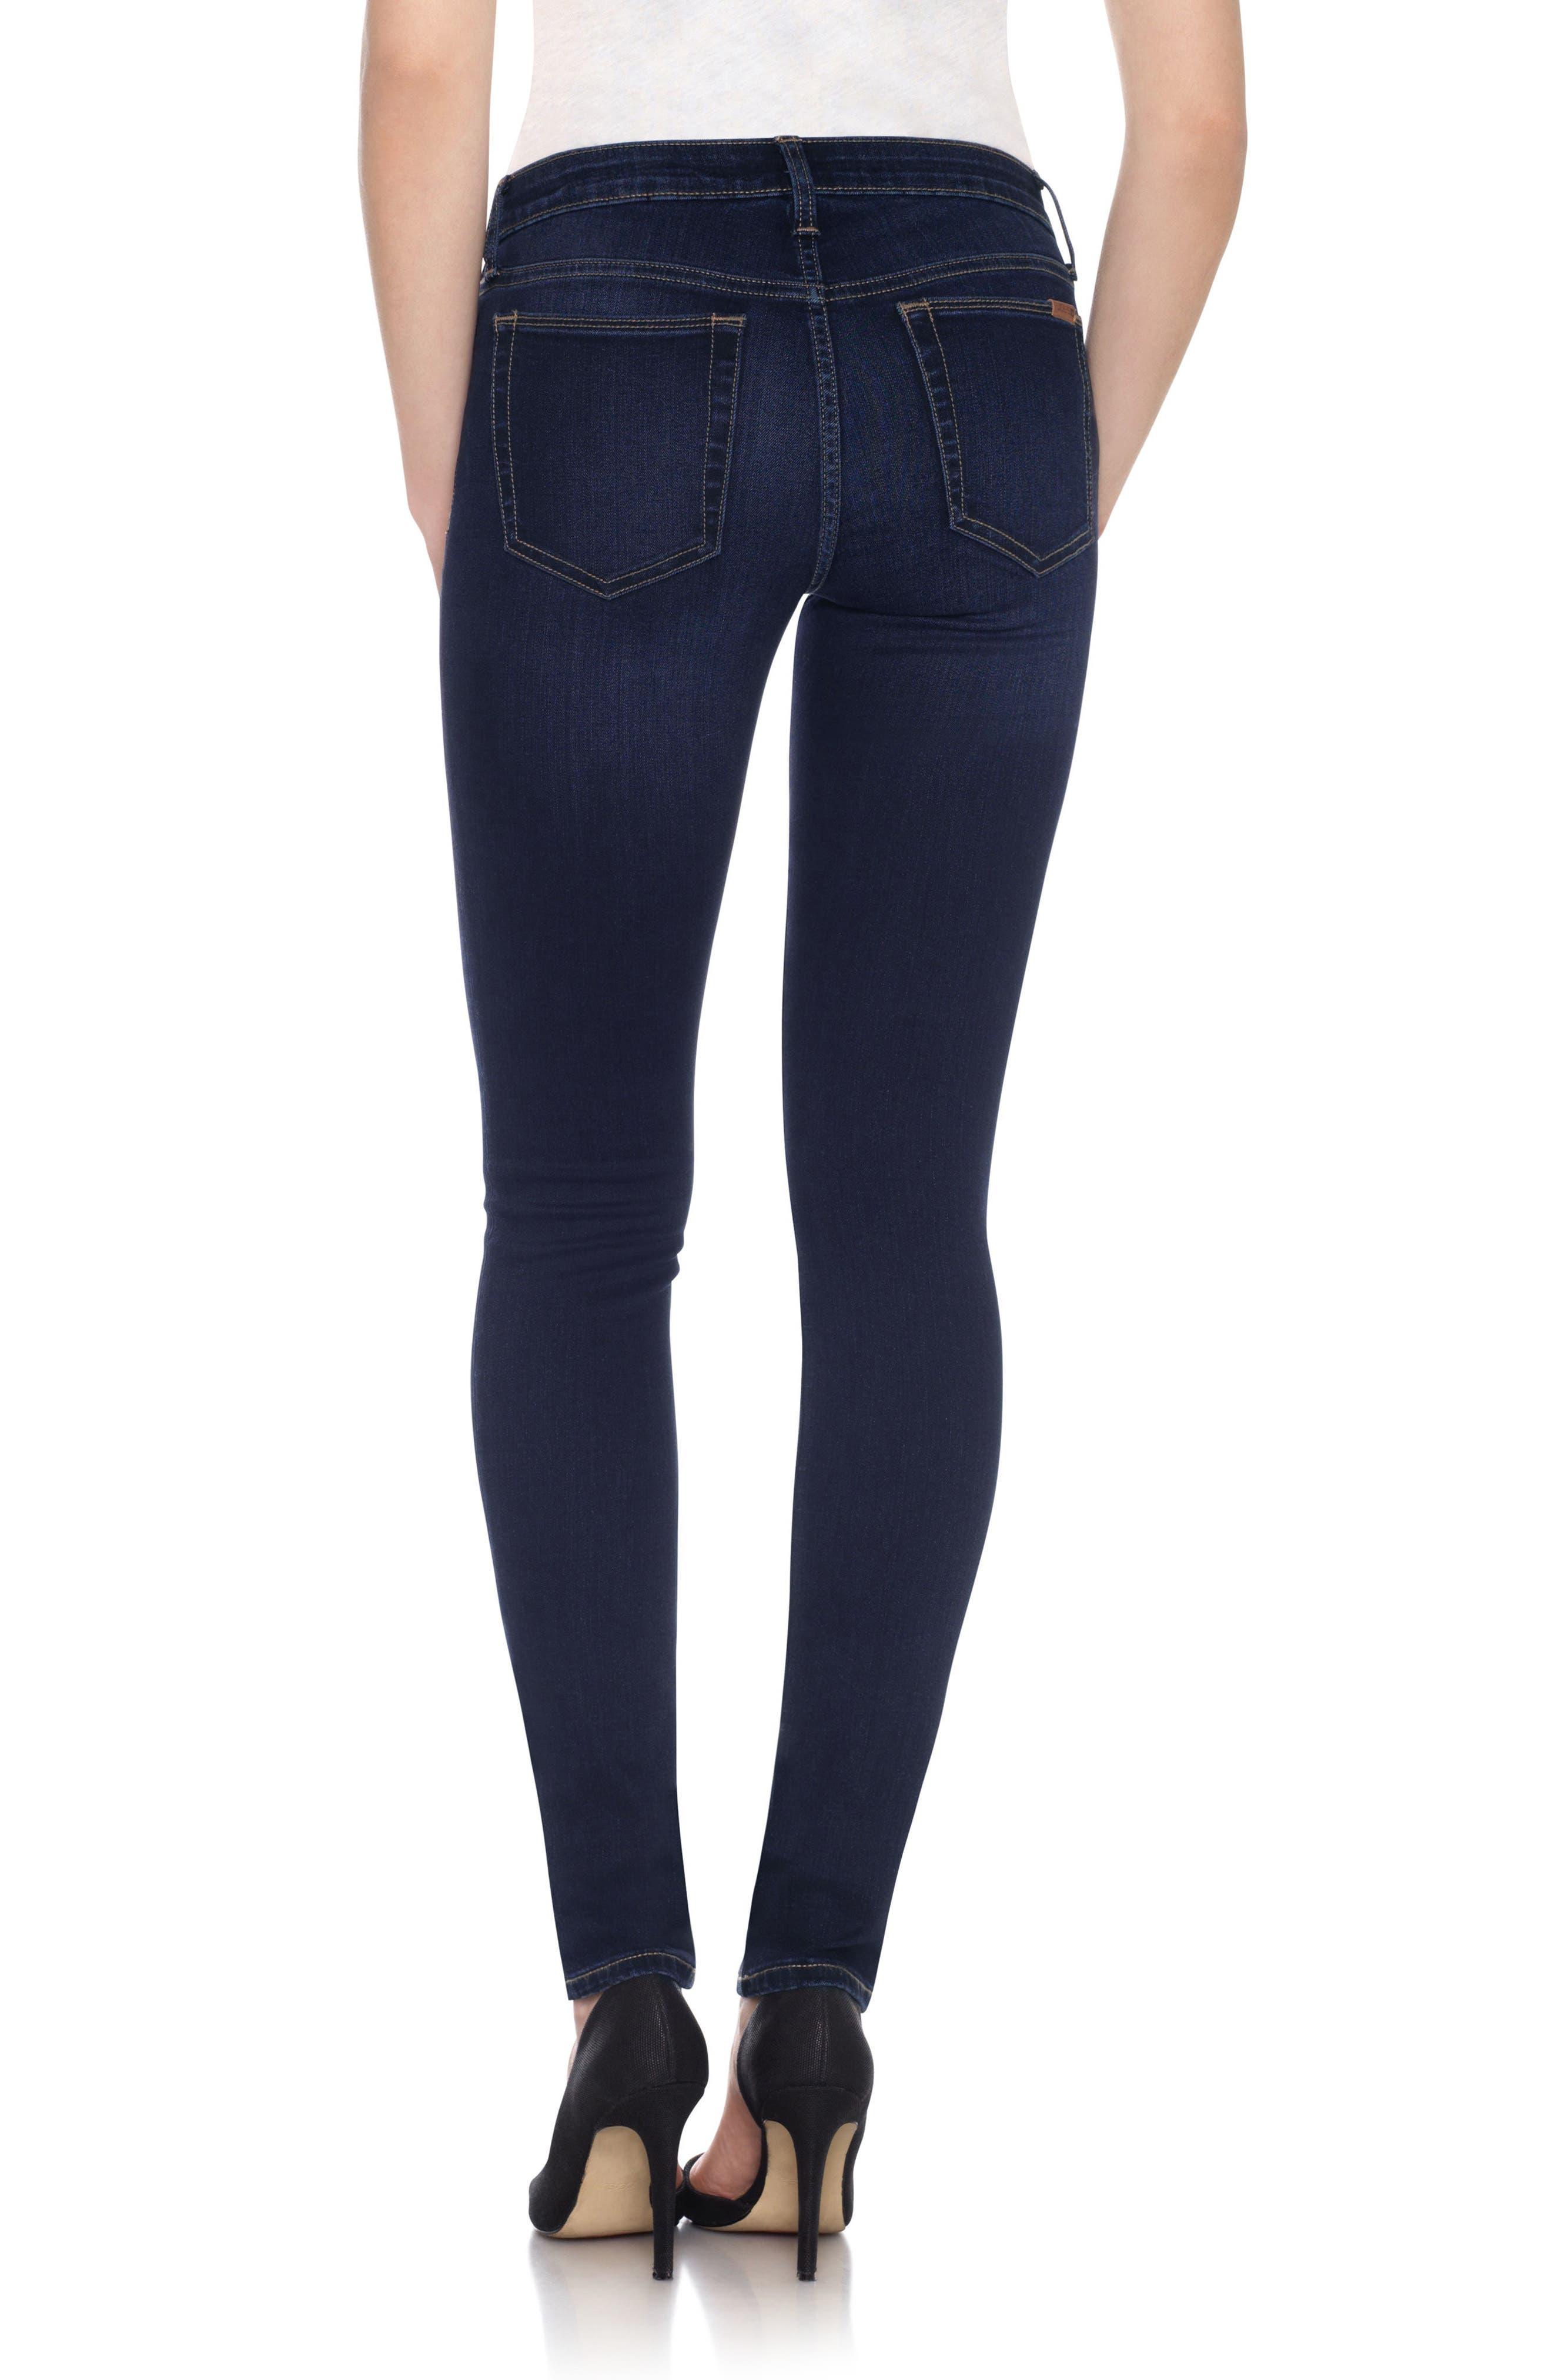 Honey Curvy Skinny Jeans,                             Alternate thumbnail 2, color,                             400